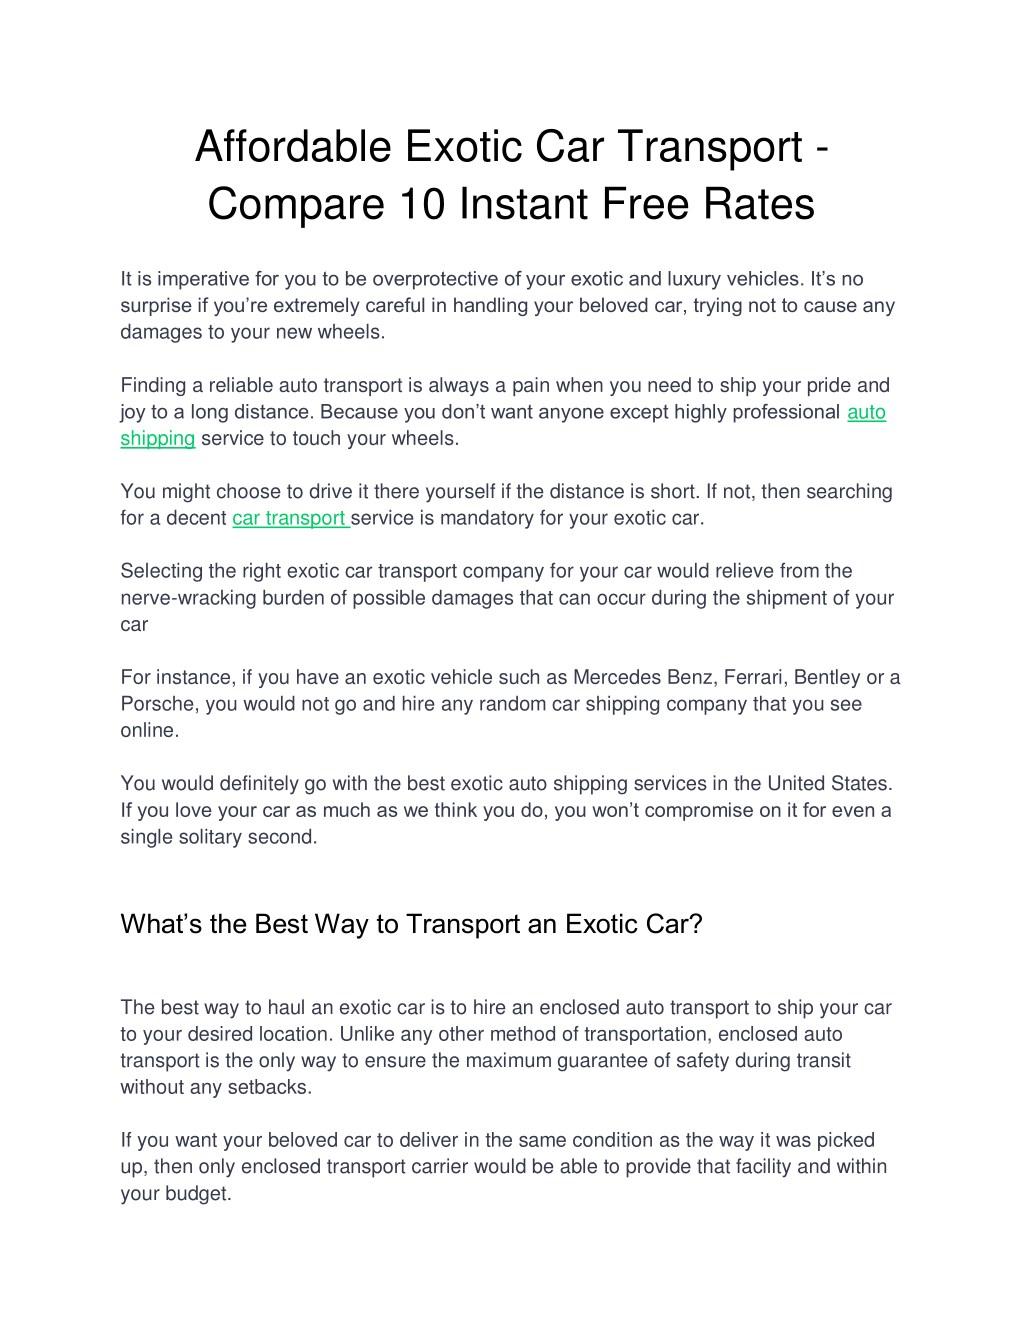 Car Transport Rates >> Ppt Affordable Exotic Car Transport Compare 10 Instant